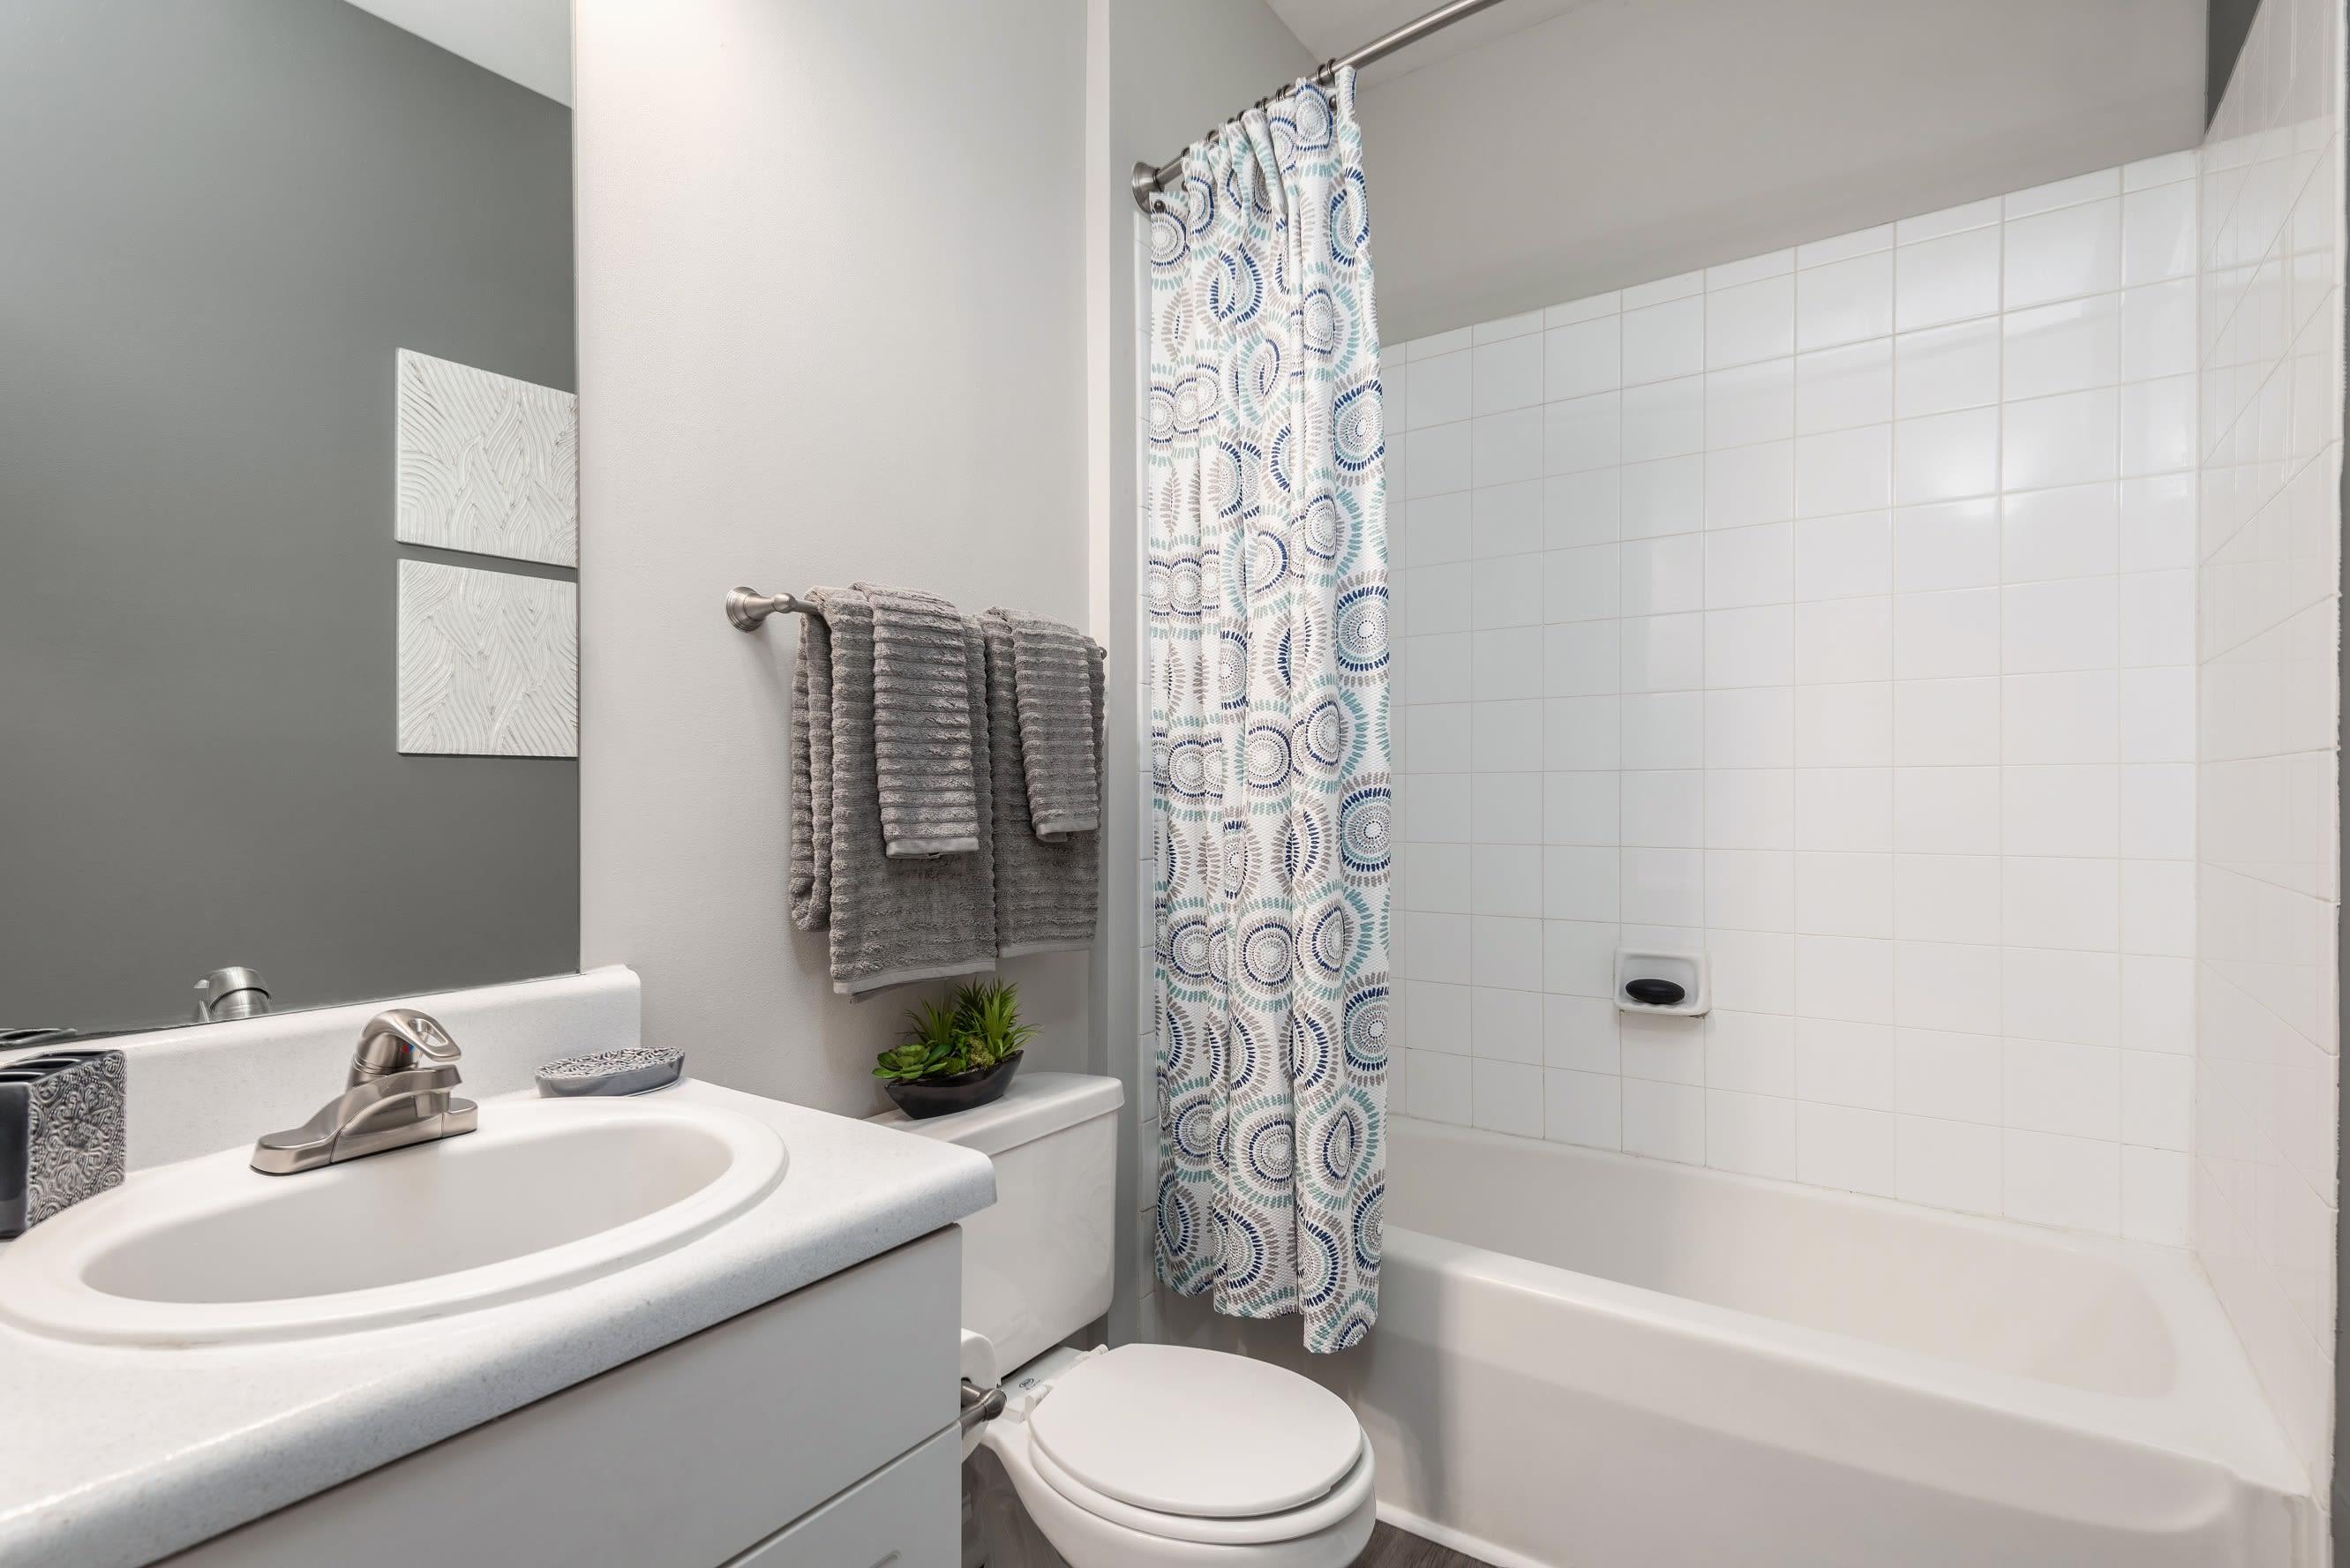 Bathroom at Highlands at Alexander Pointe in Charlotte, North Carolina